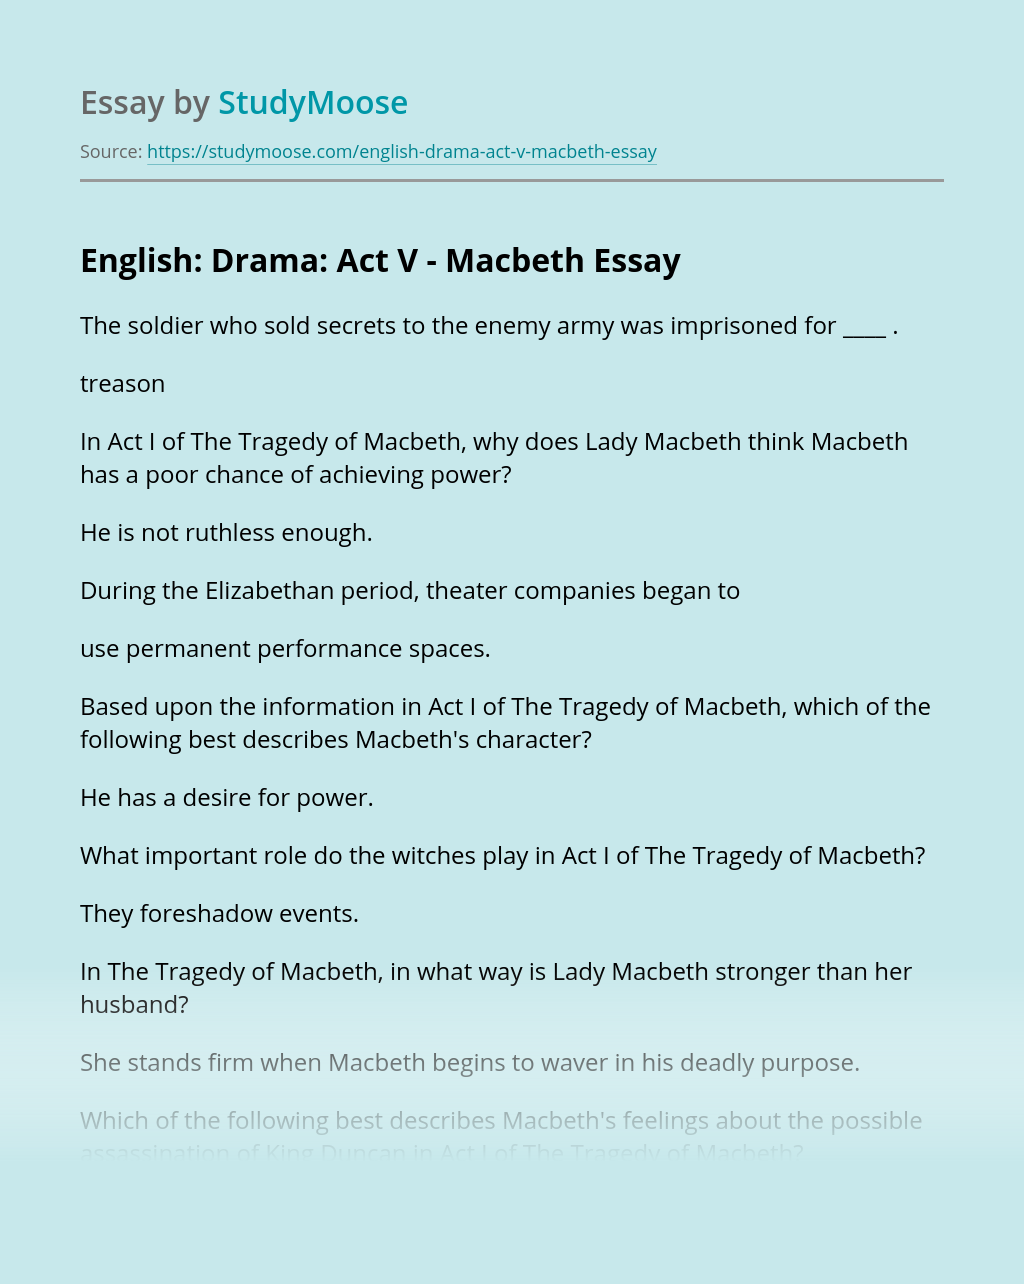 English: Drama: Act V - Macbeth